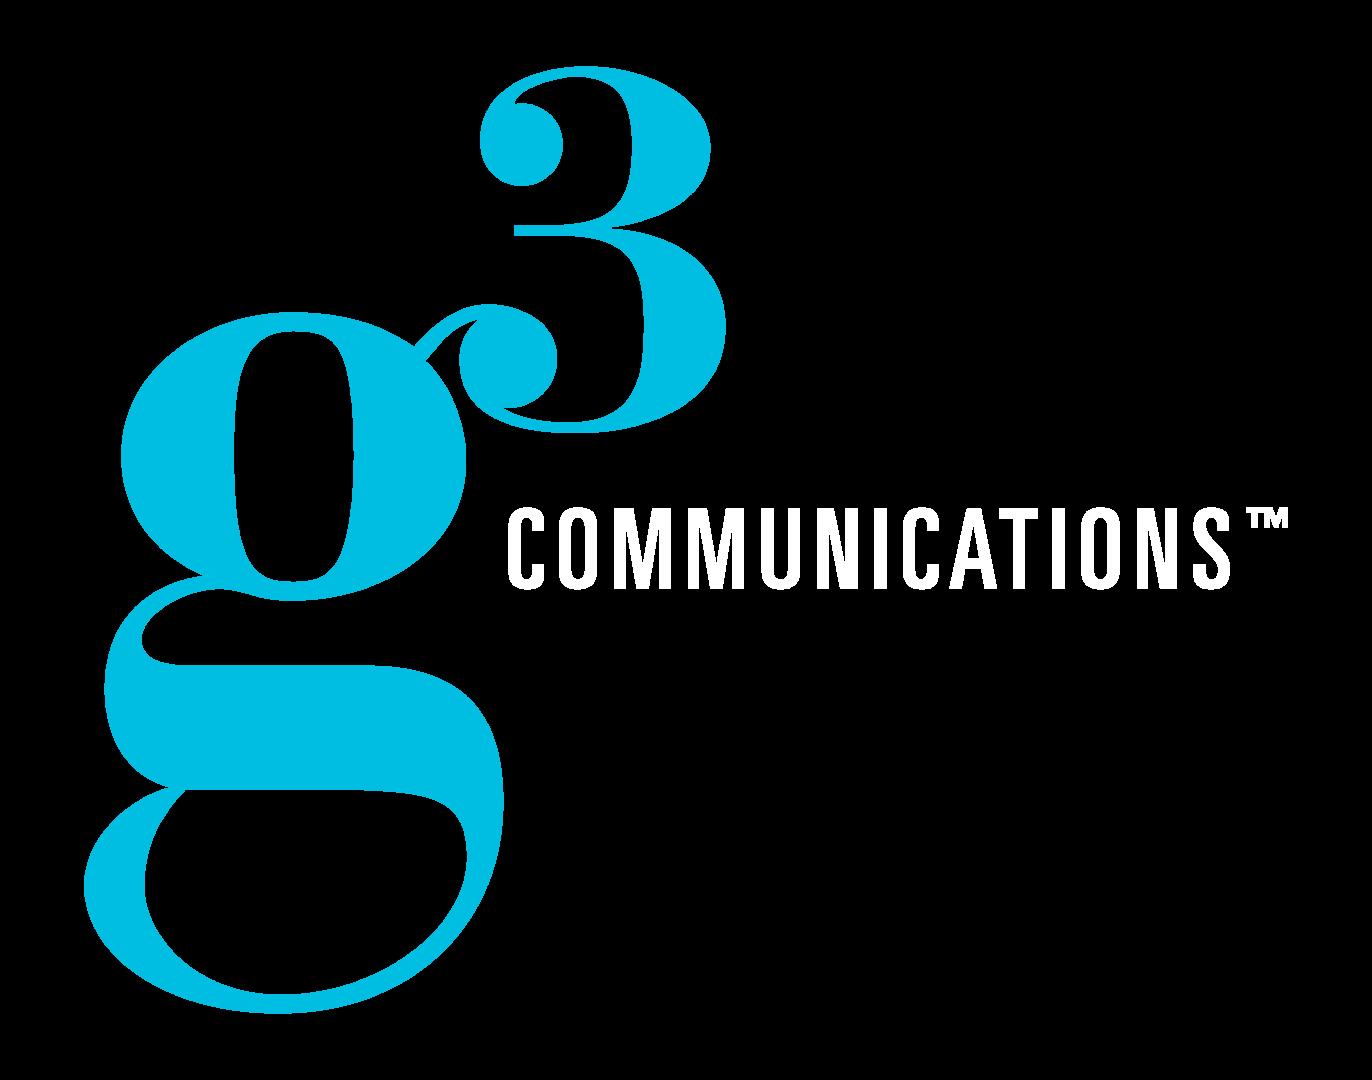 G3 Communications